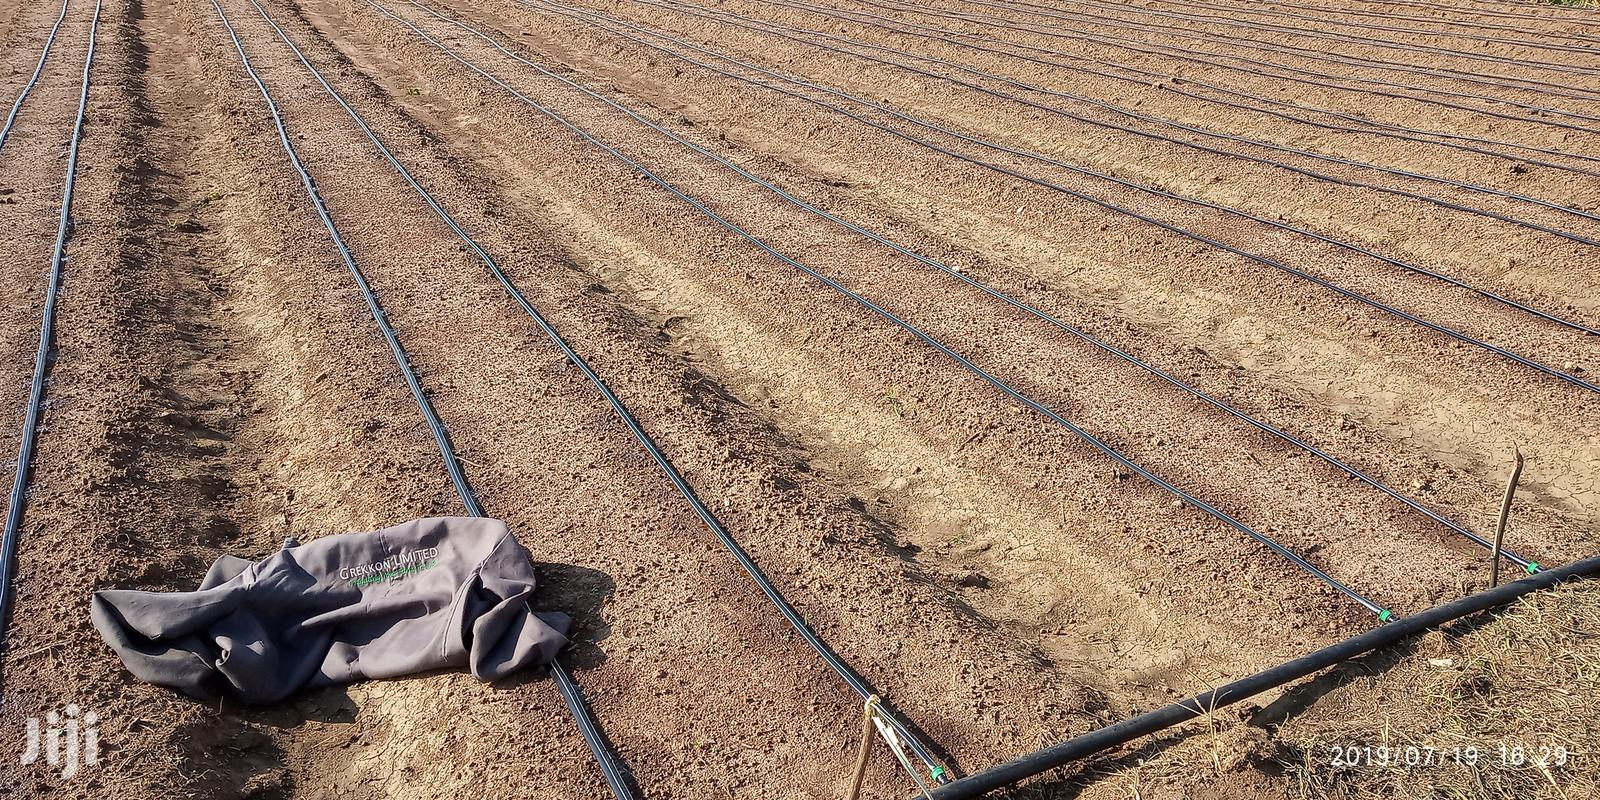 Affordable Drip Irrigation Kits For Eighth 1 4 Acre Plots Farms | Farm Machinery & Equipment for sale in Langas, Uasin Gishu, Kenya